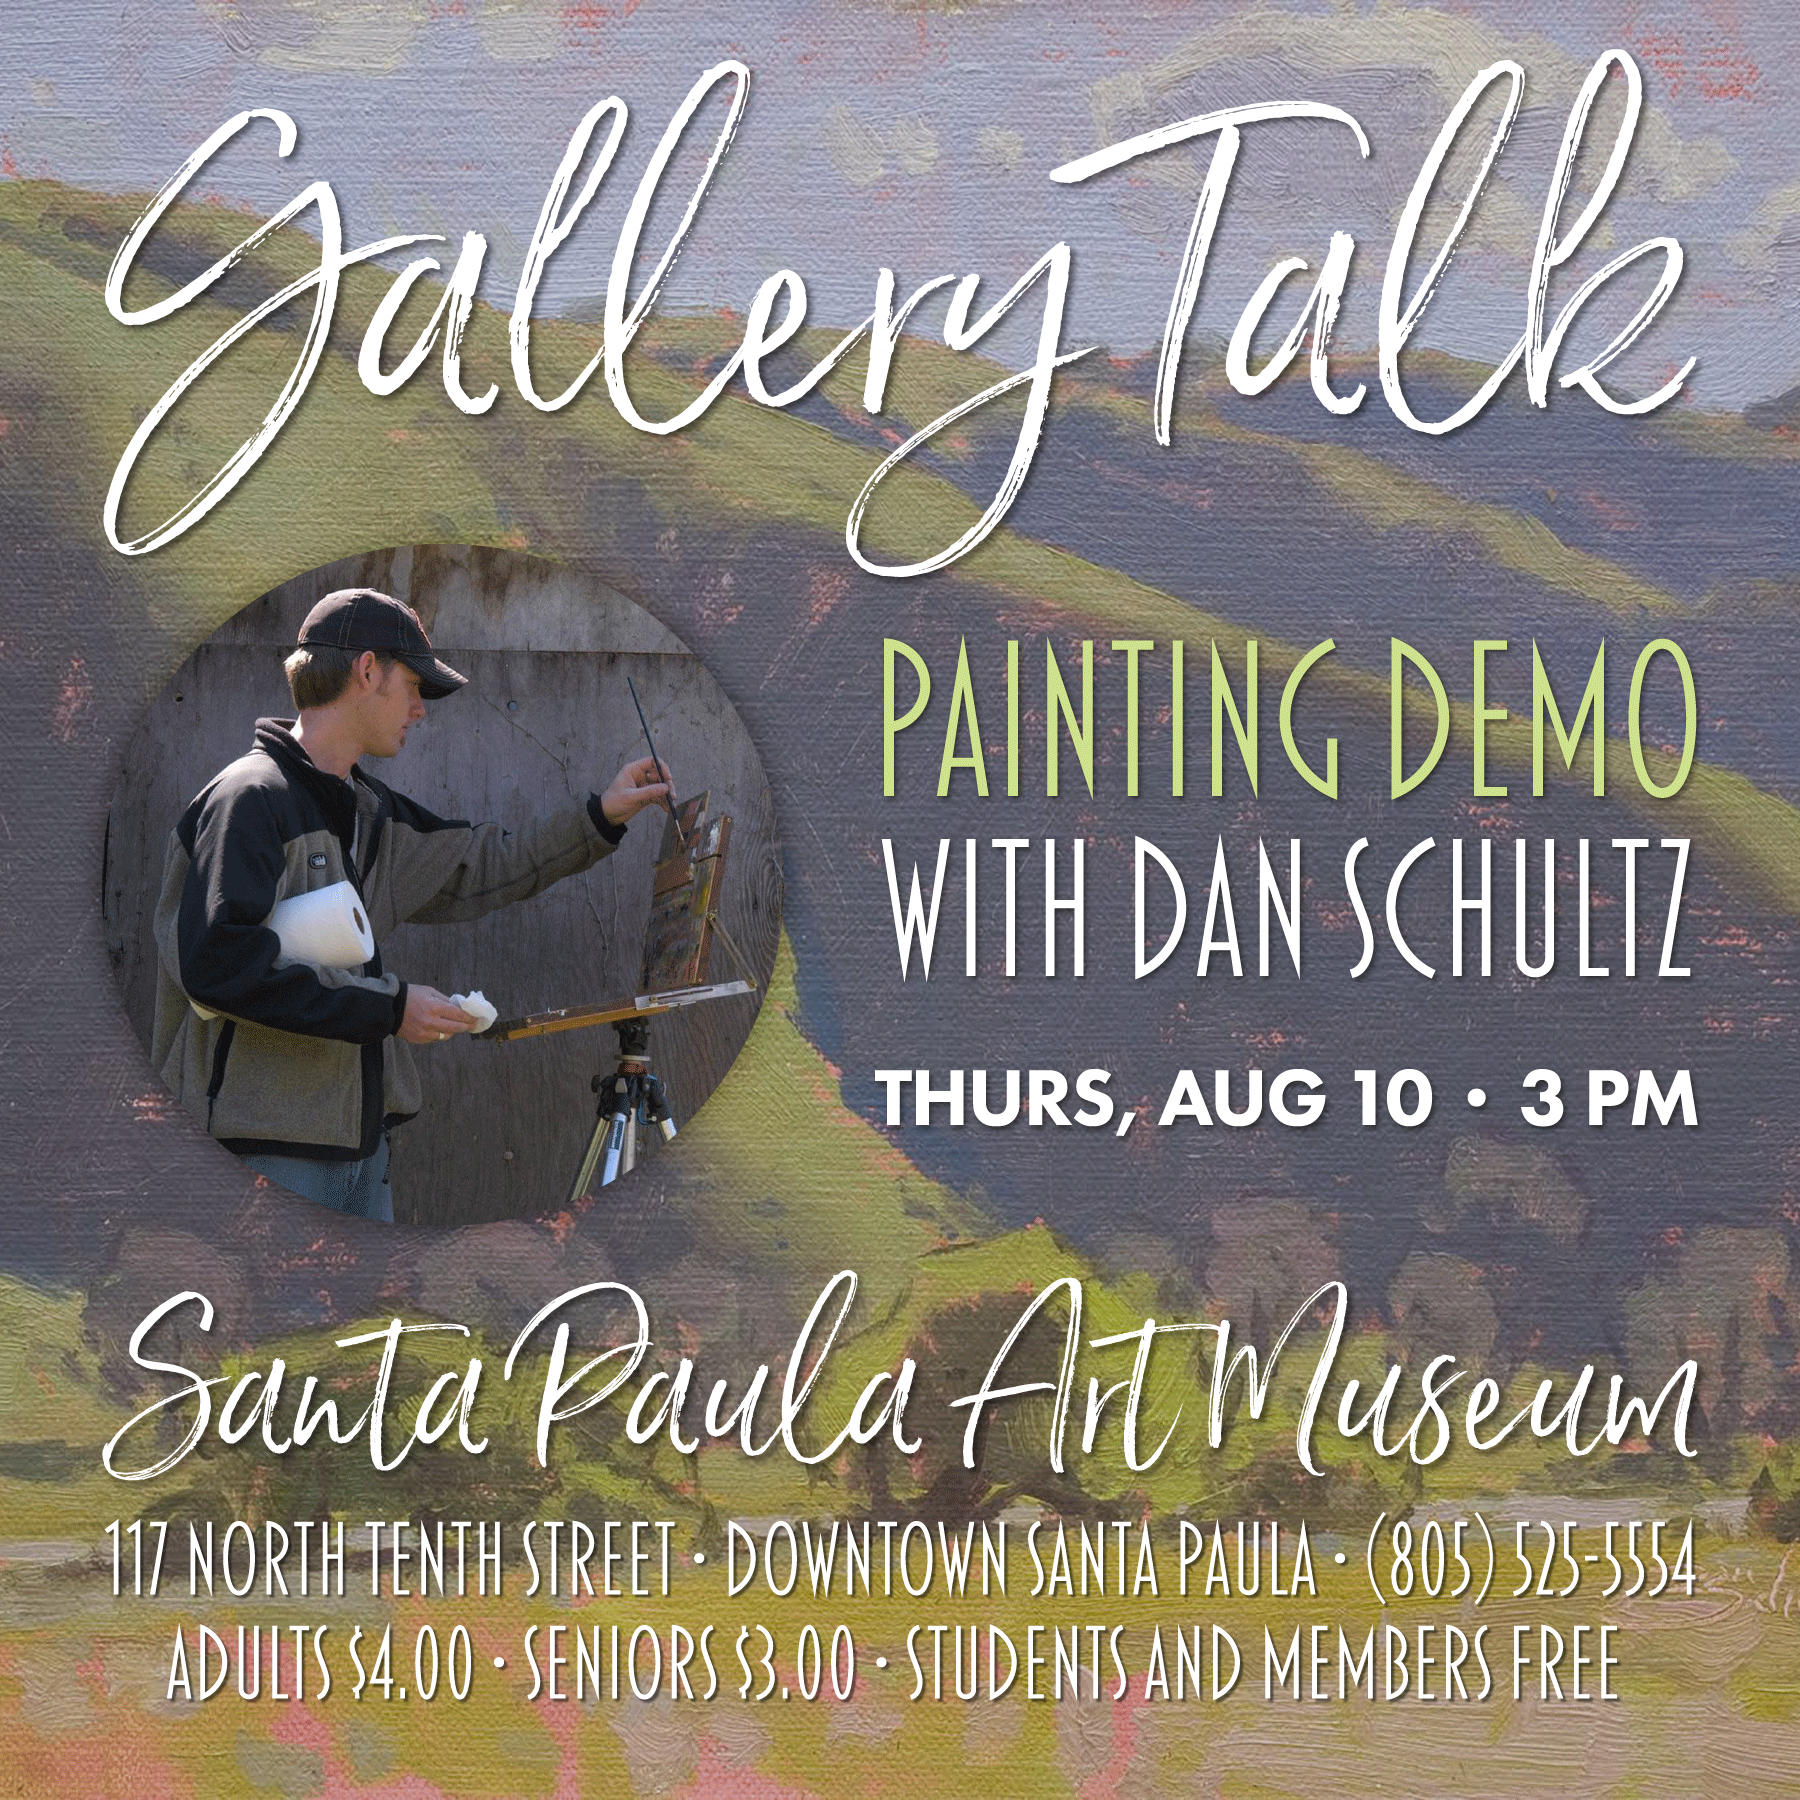 Aug. 10 — Live Painting Demonstration by Ojai Artist Dan Schultz to be held at Santa Paula Art Museum